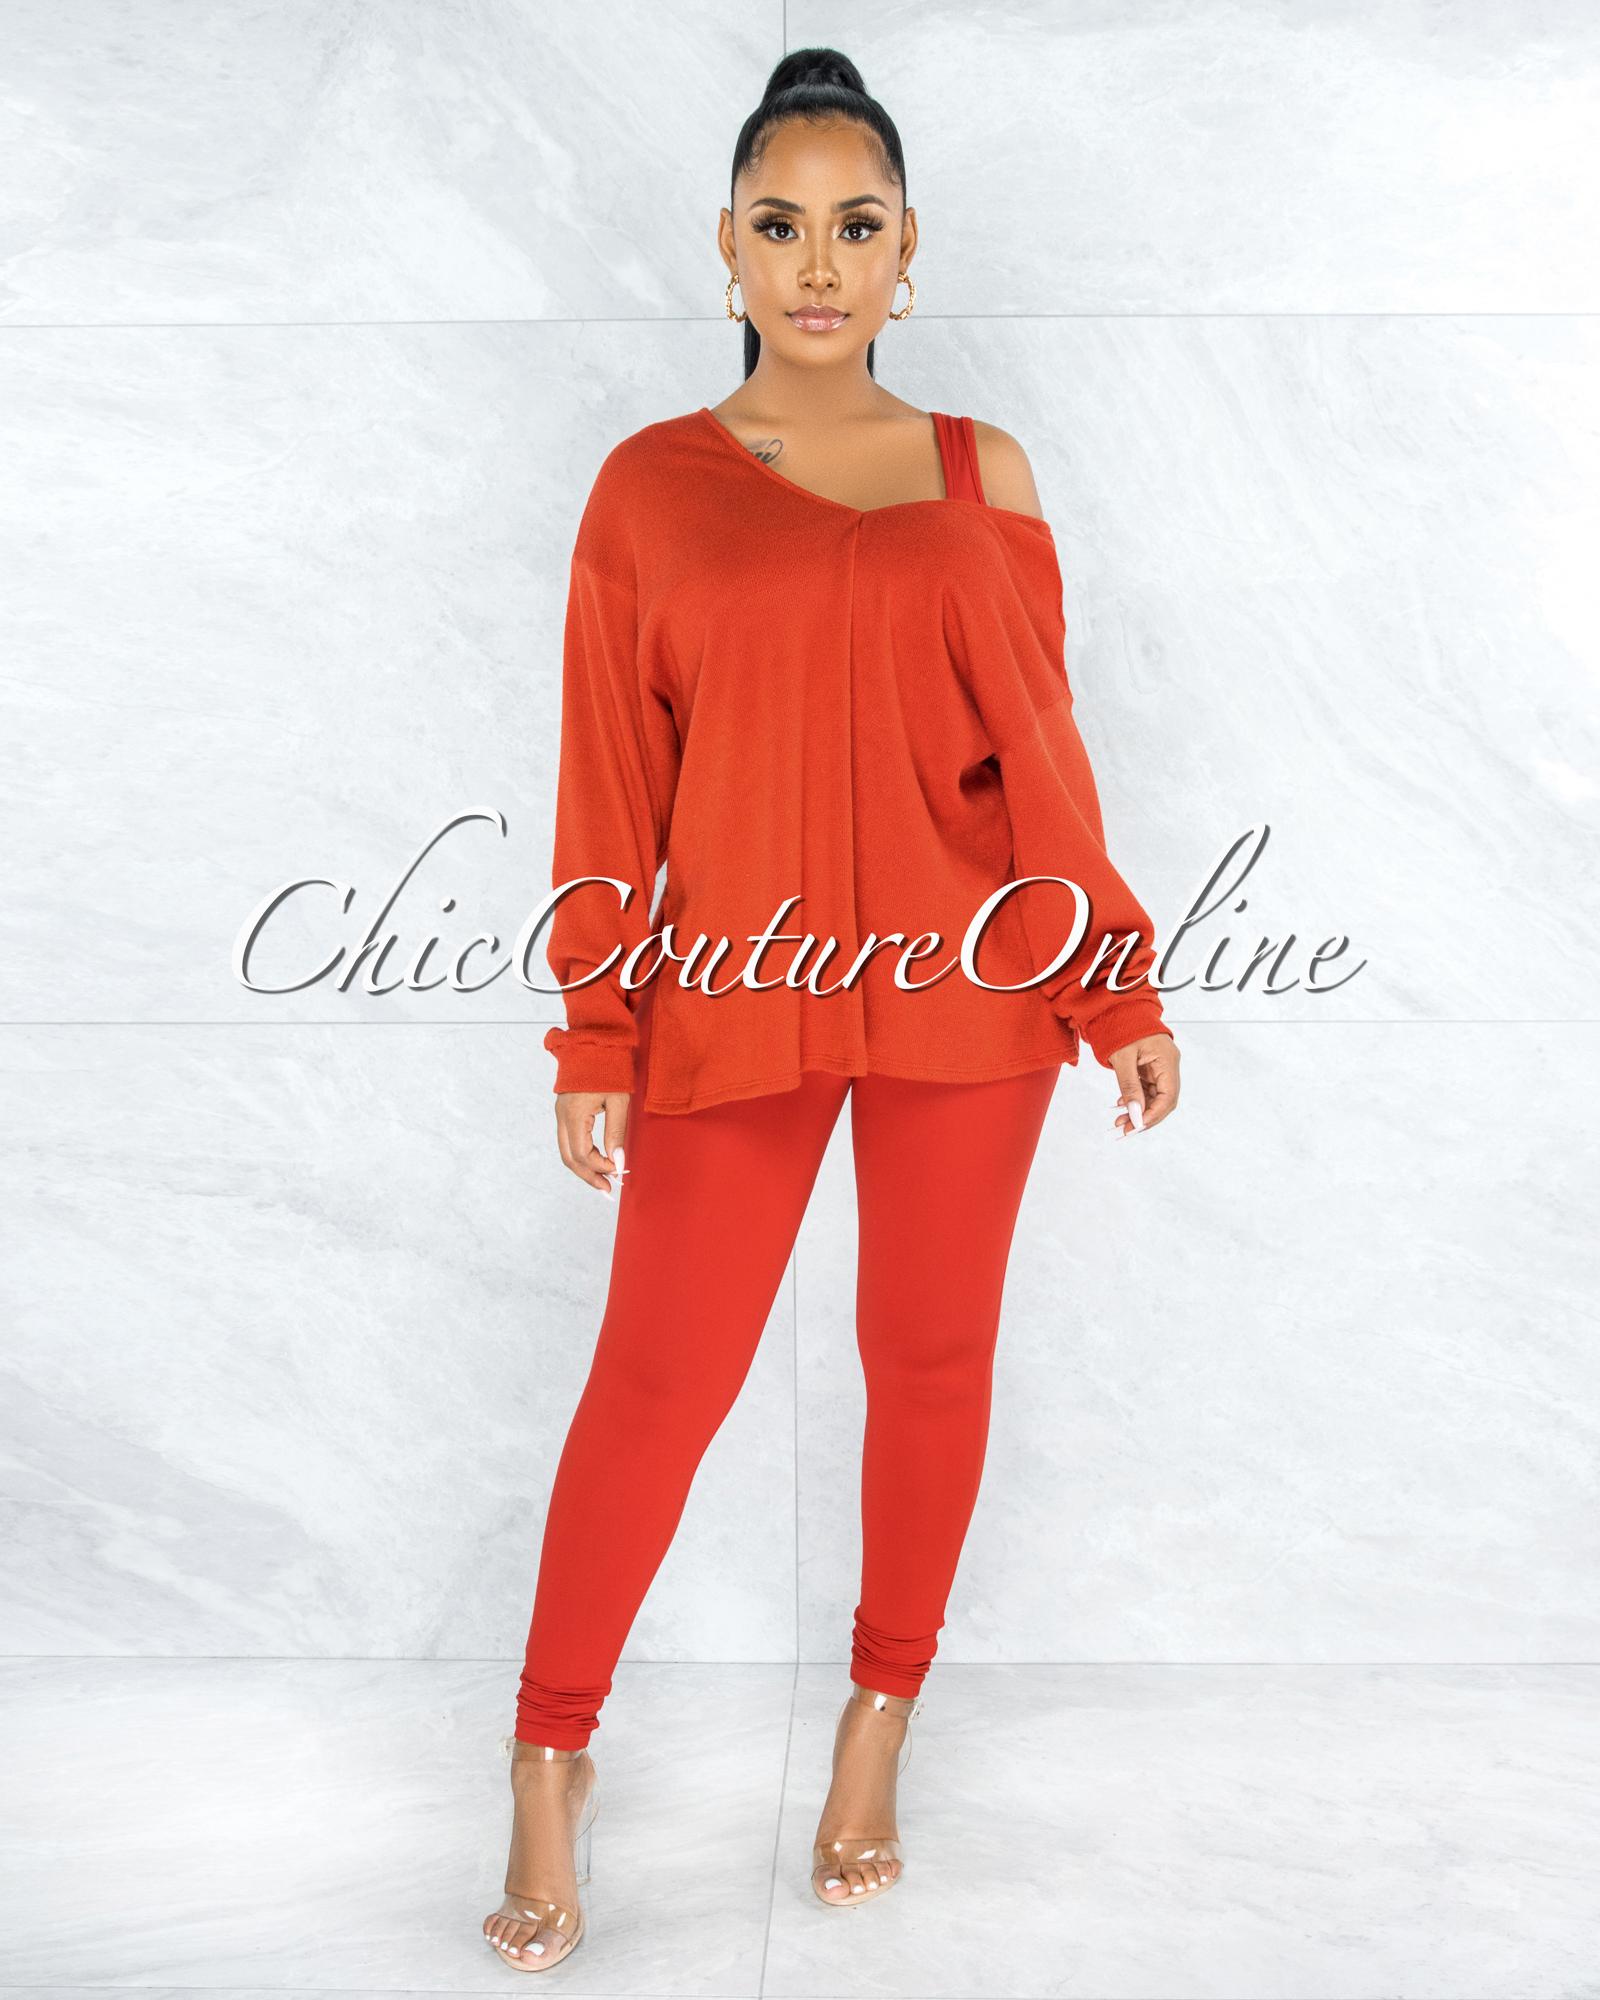 Thirza Orange Knit Sweater Top & Leggings Three Piece Set